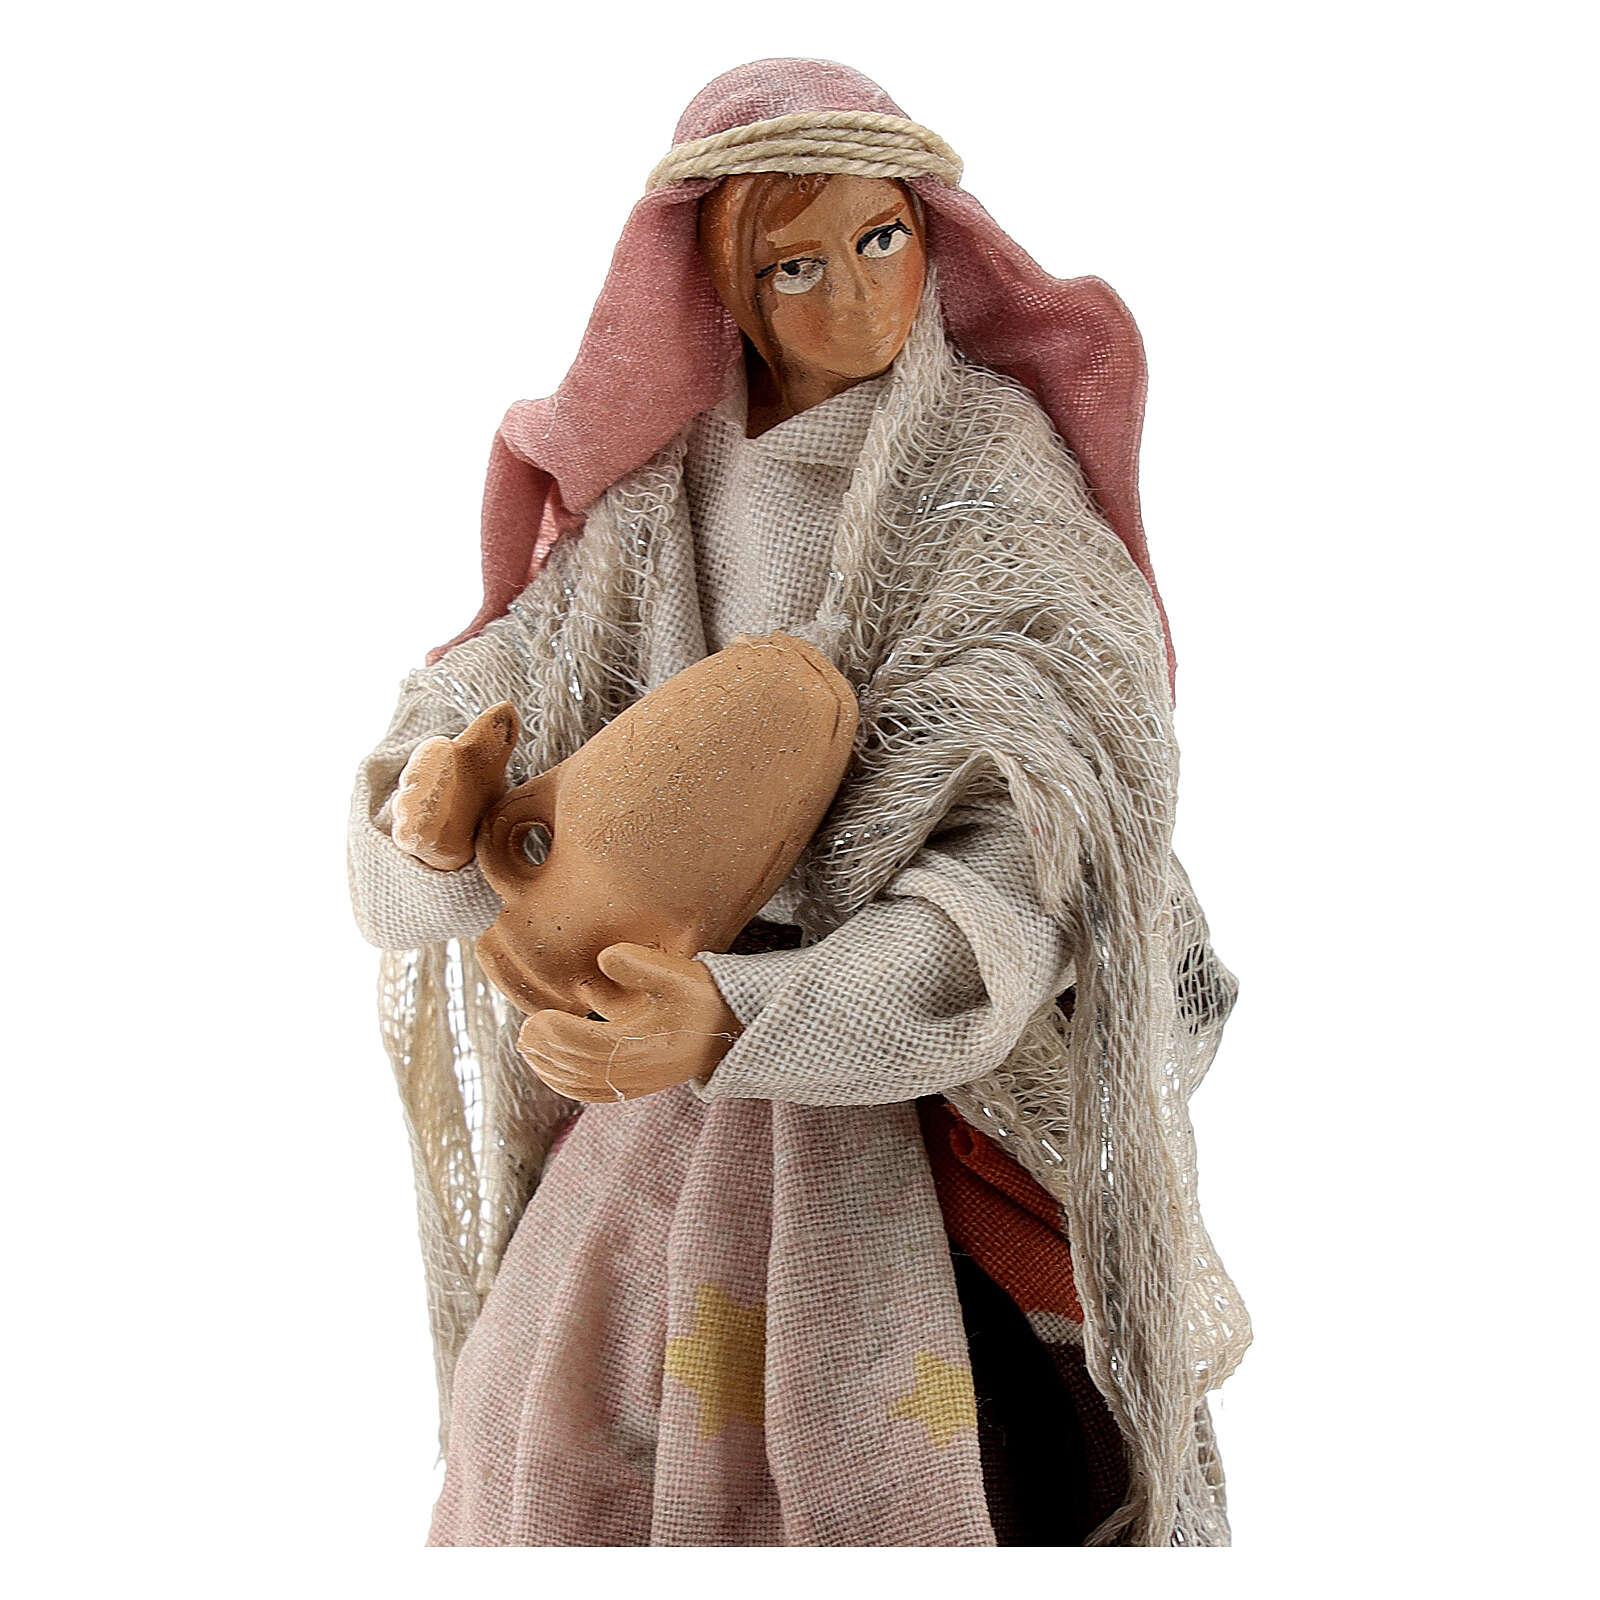 Woman with vases in terracotta, 12 cm Neapolitan nativity 4